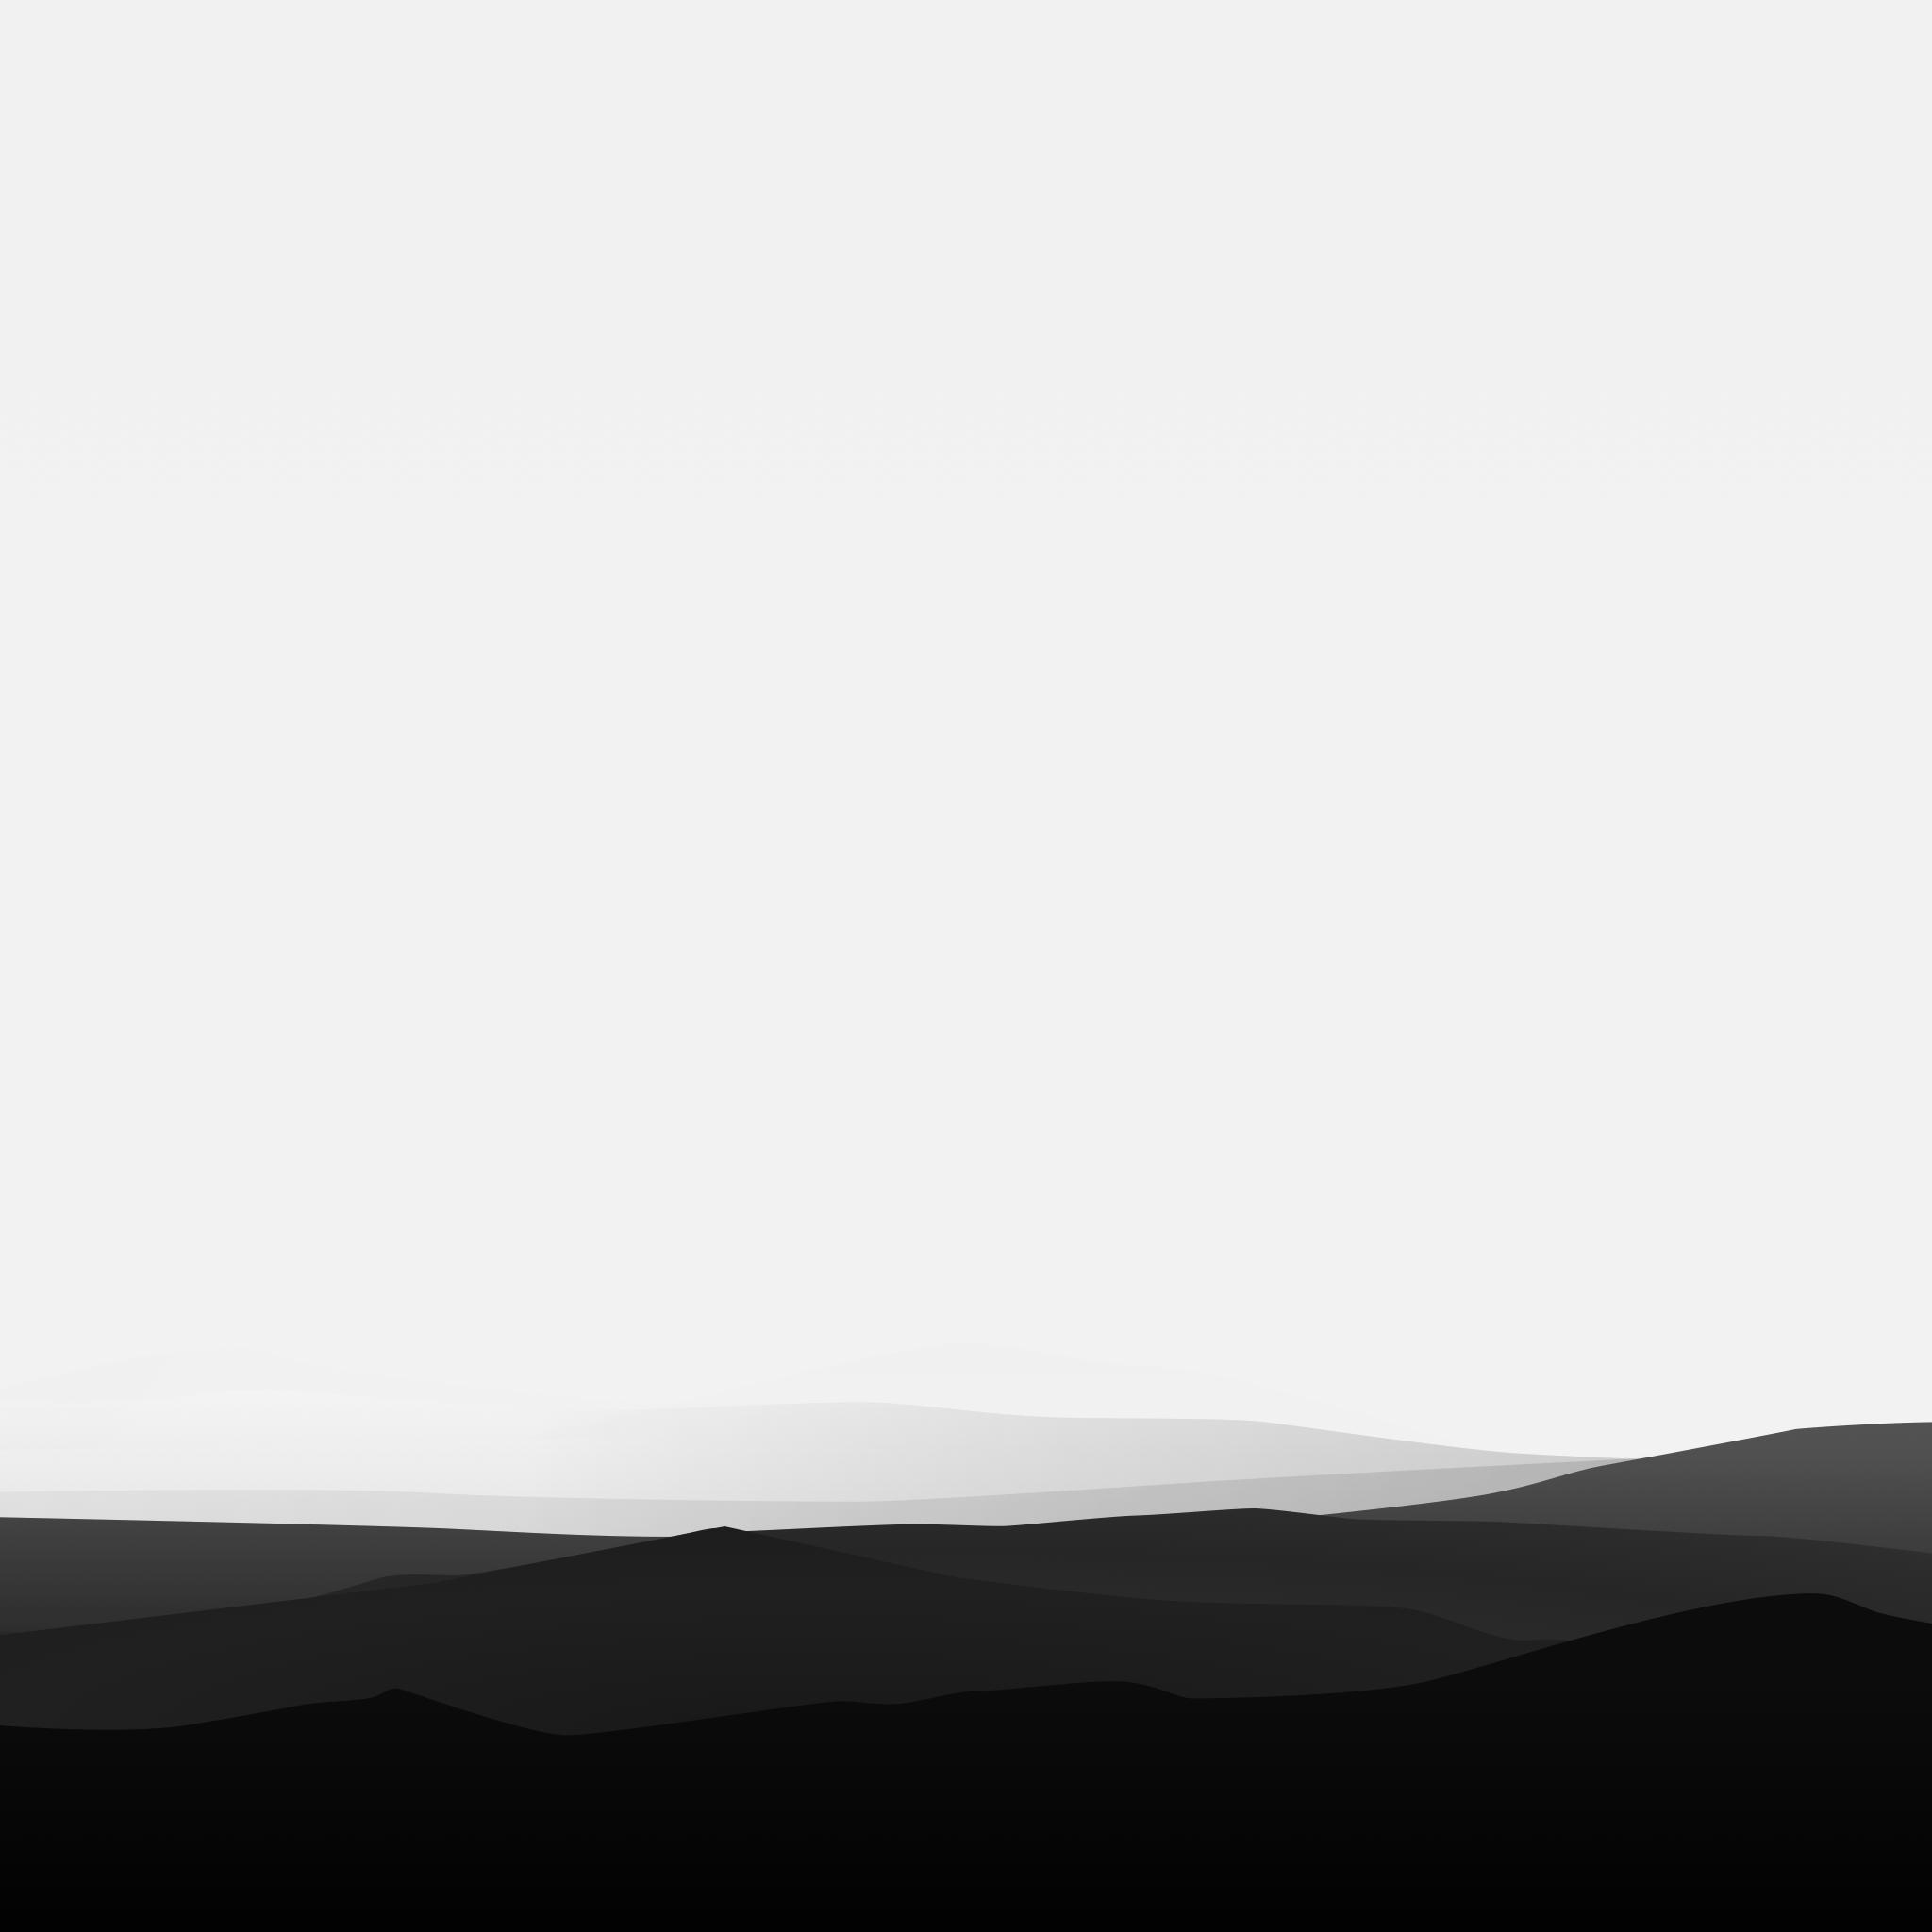 Minimalist Black And White Wallpapers Top Free Minimalist Black